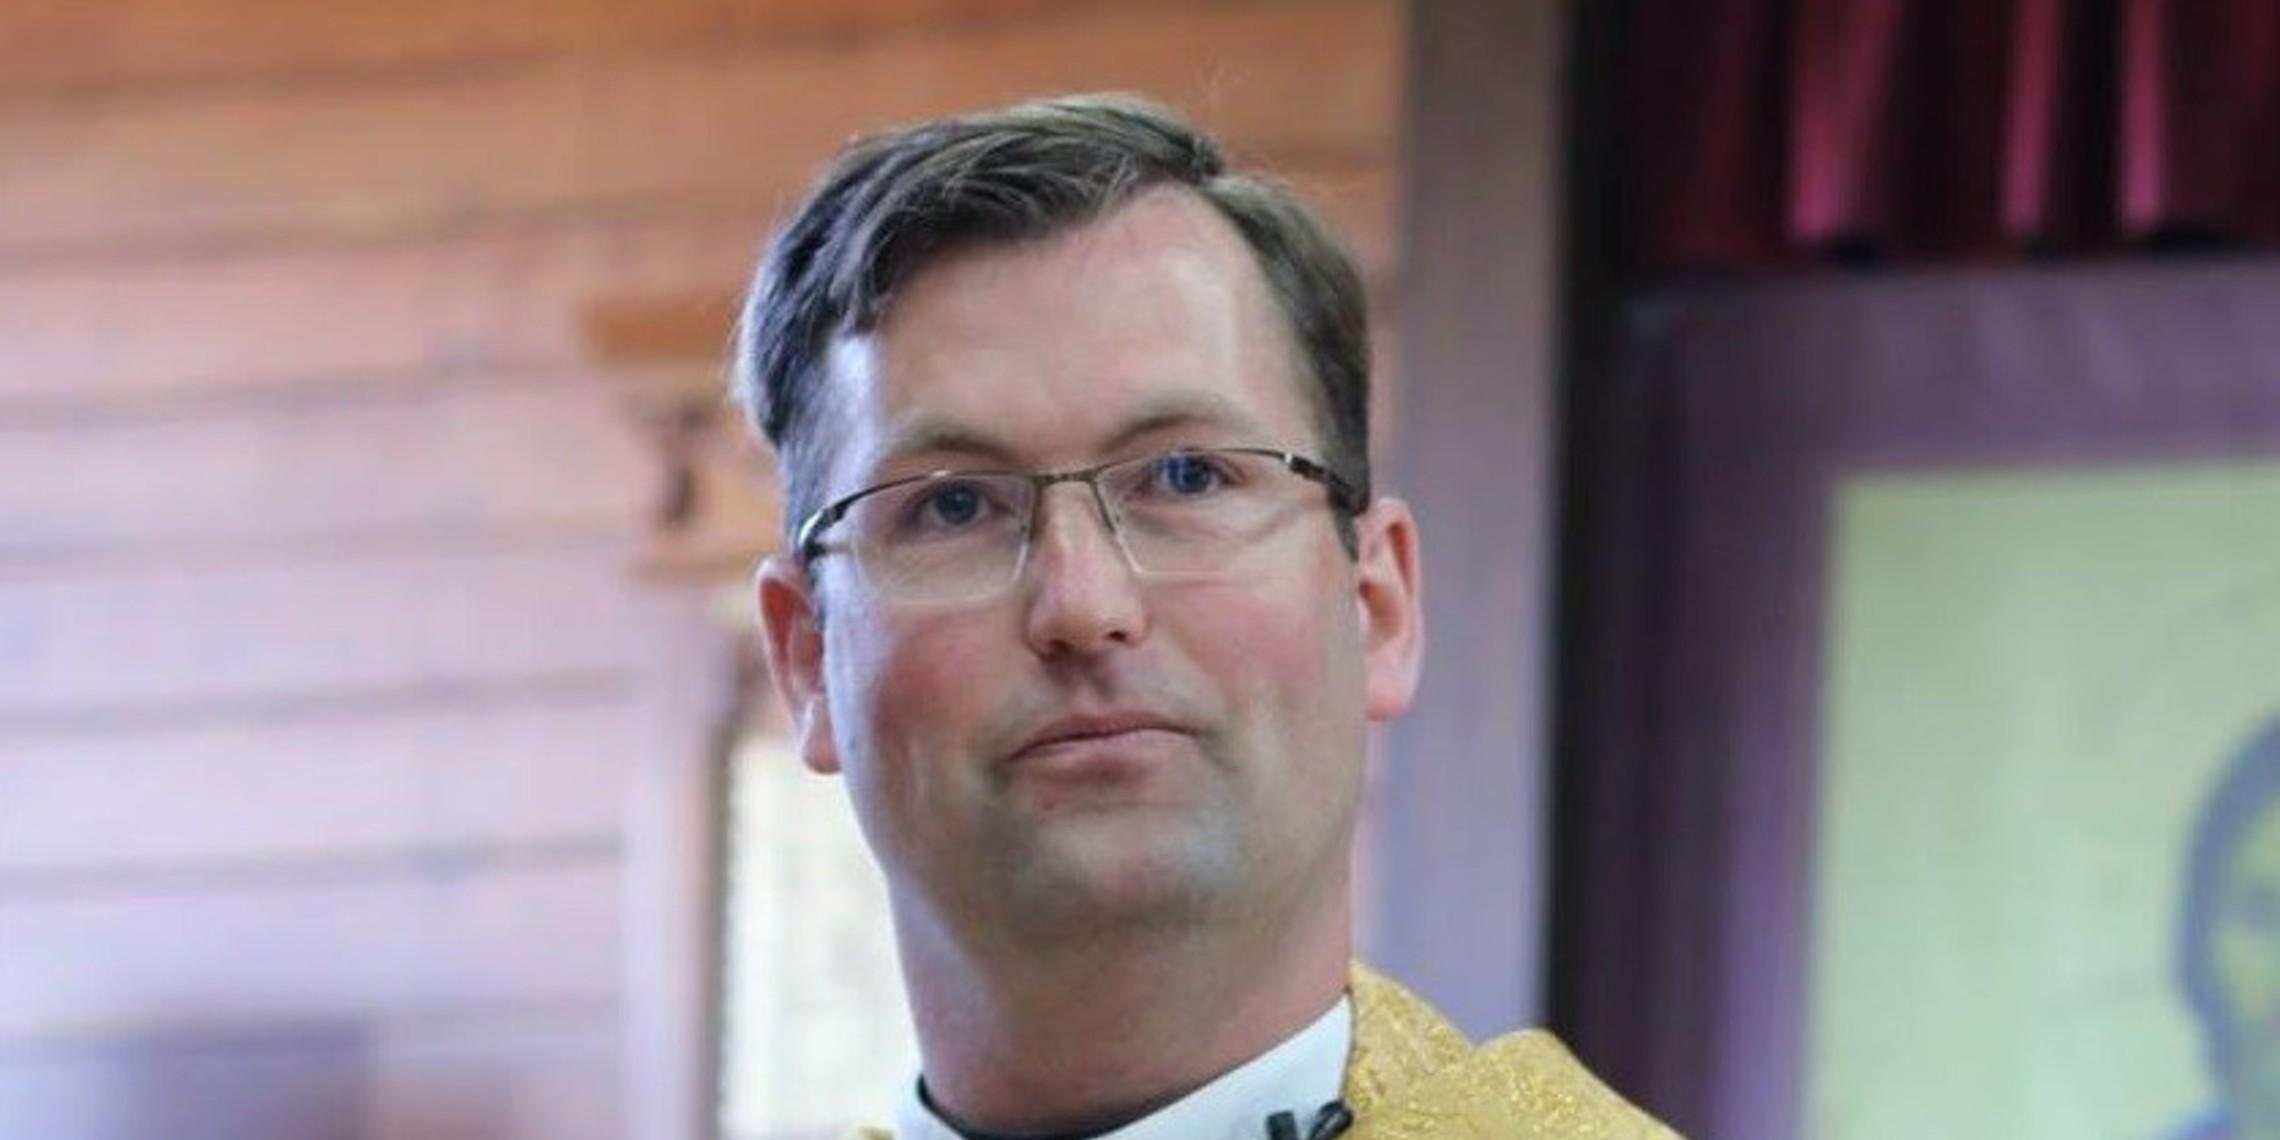 Fr. David Joyce, LC